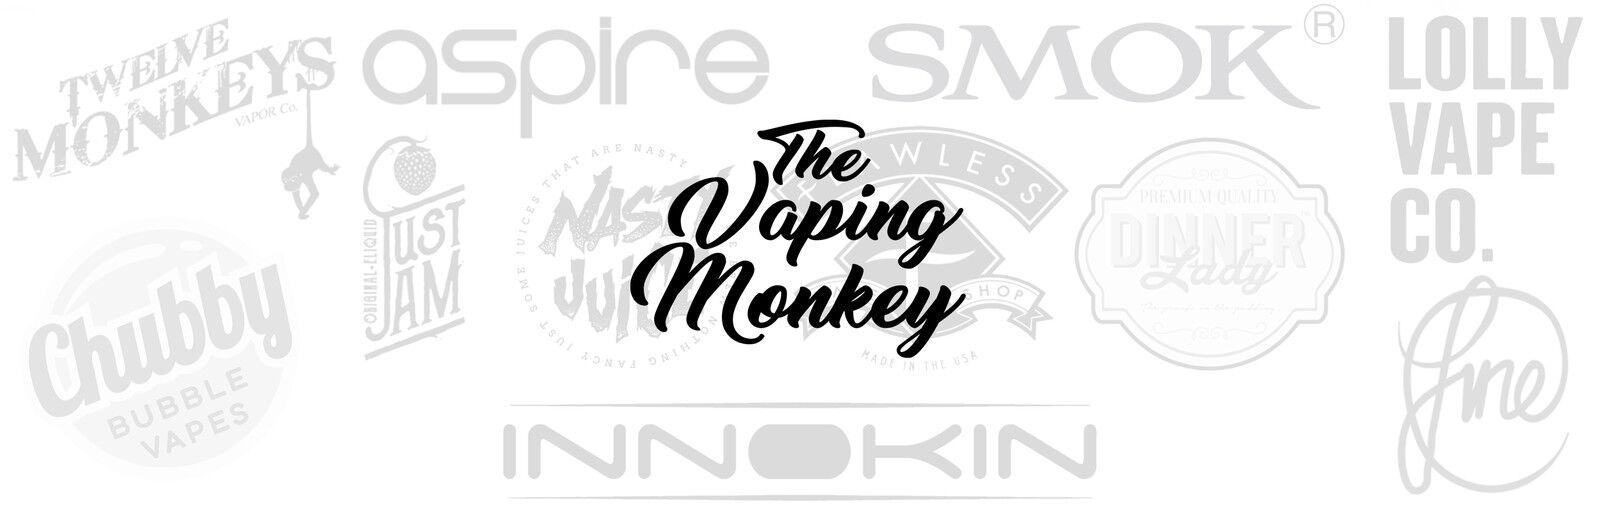 The Vaping Monkey